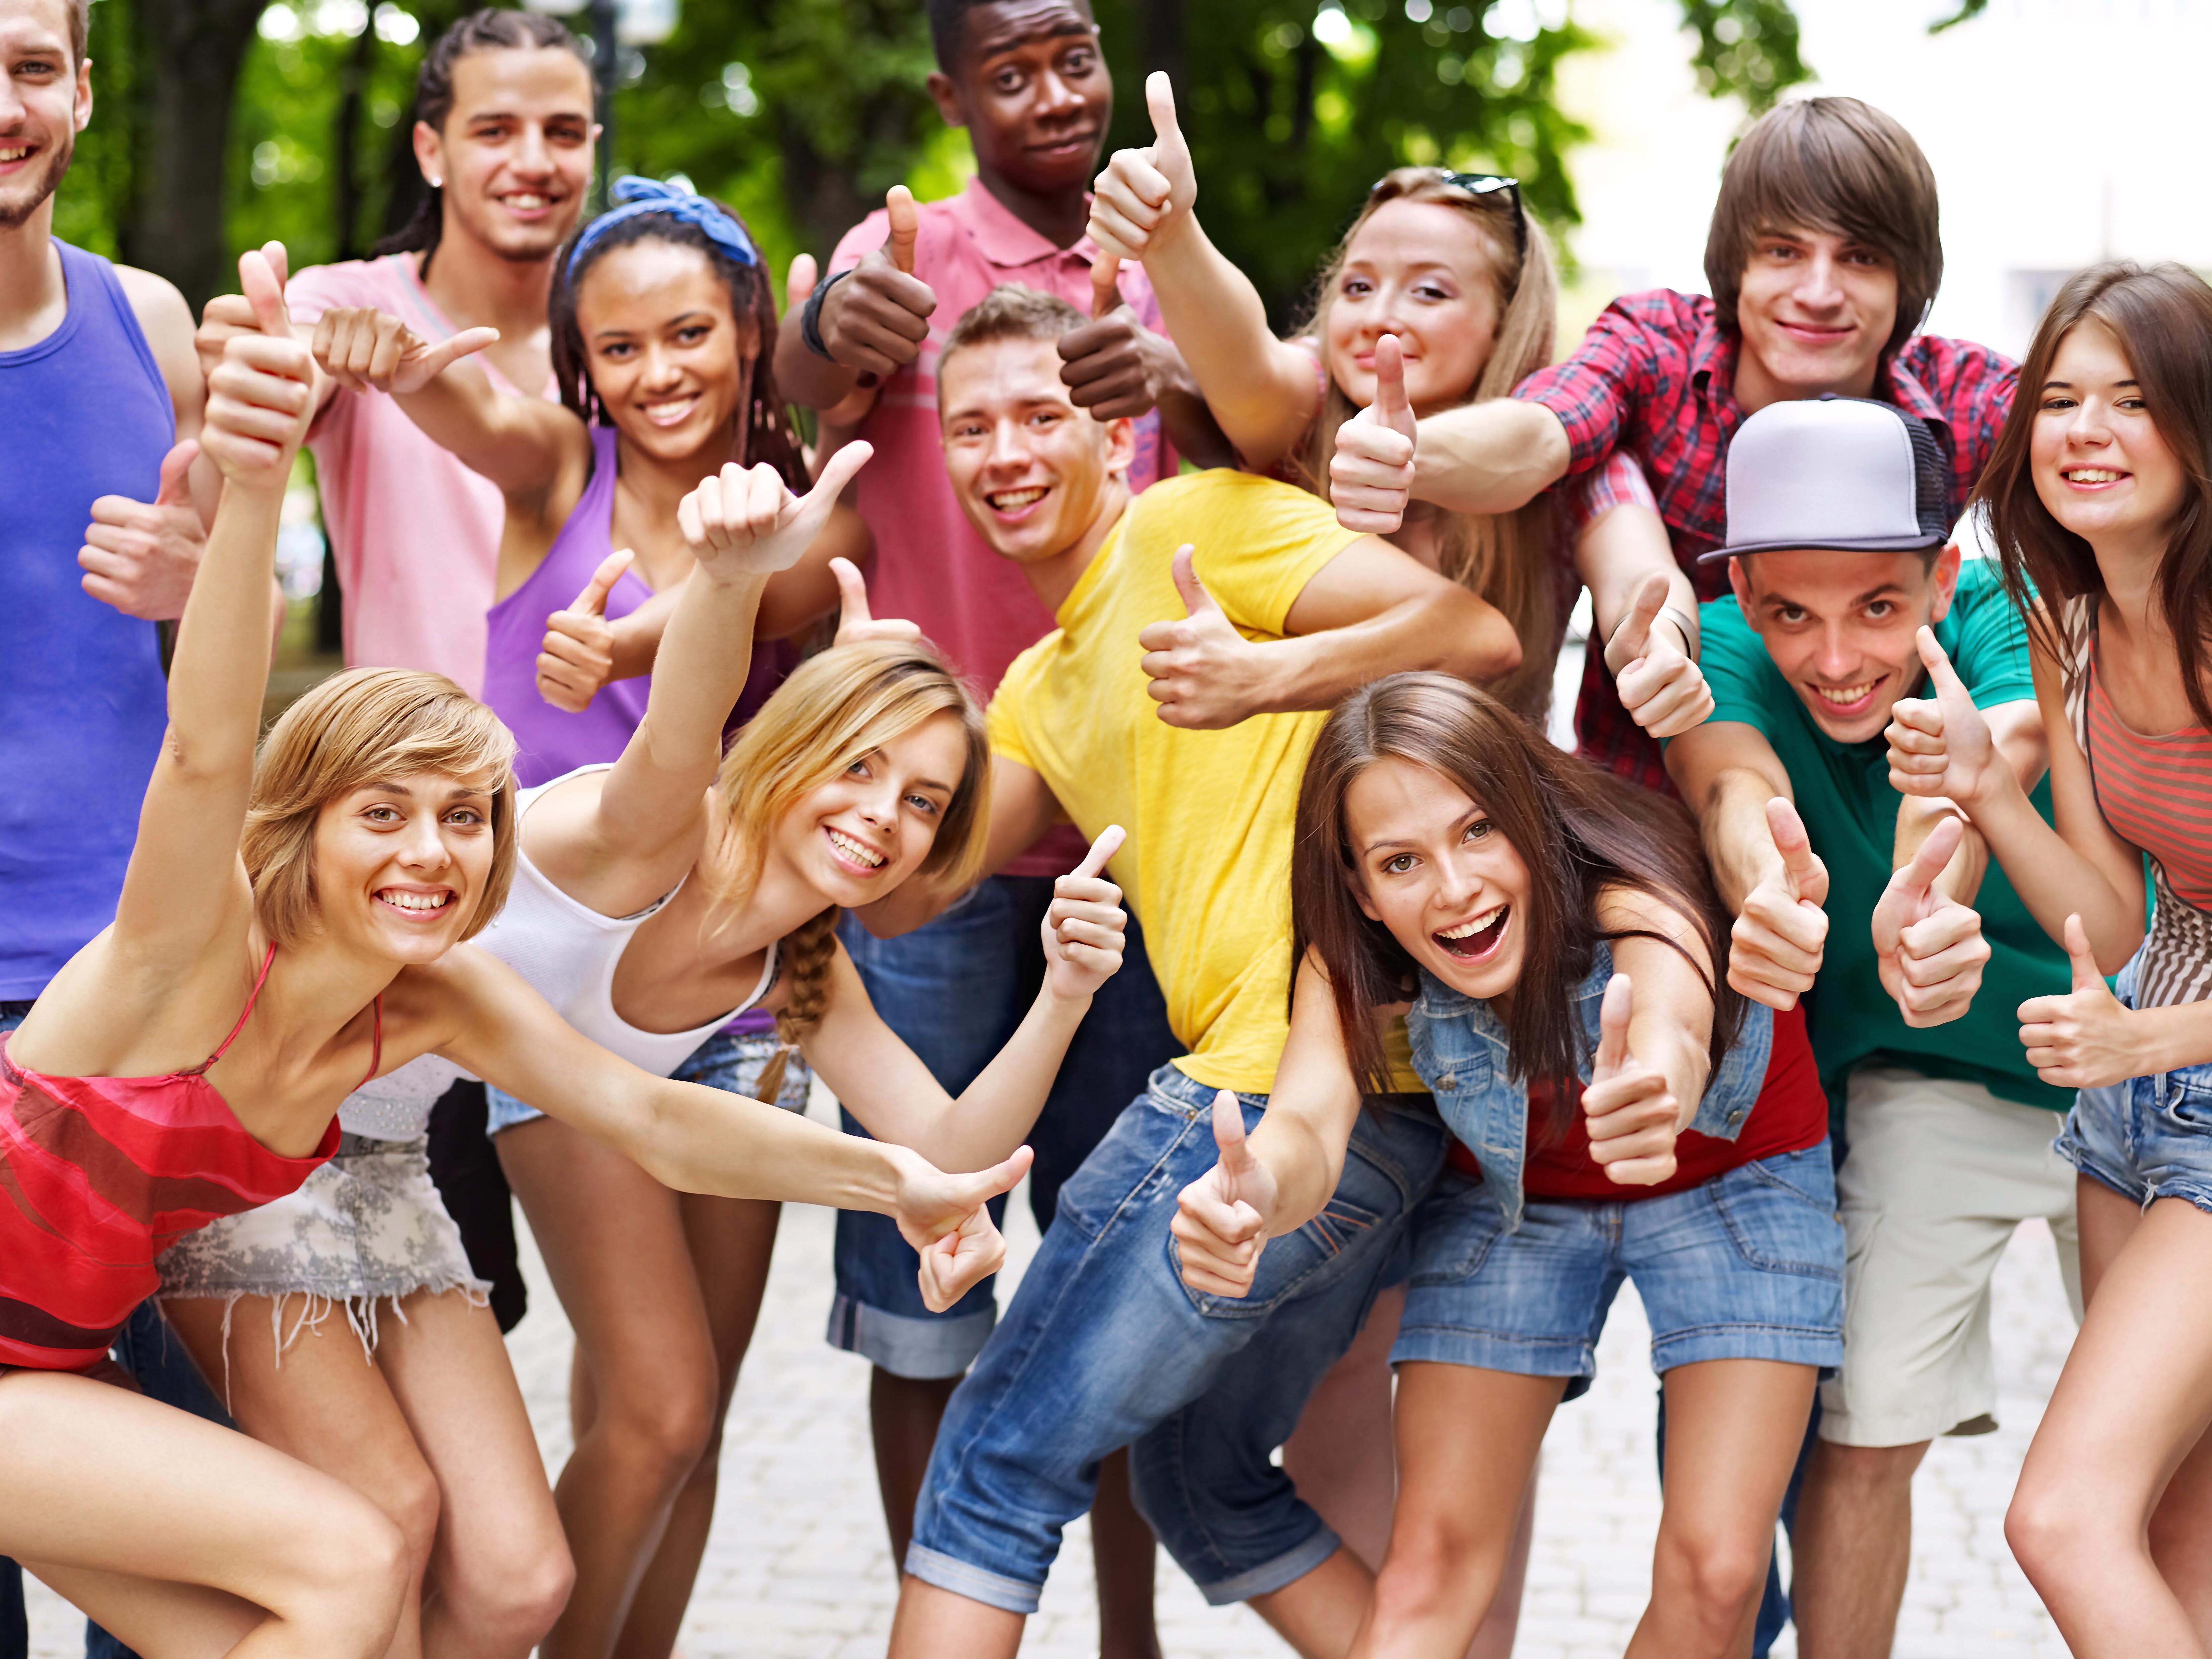 Youth 20: engagement group ufficiale del G20 dedicato ai giovani